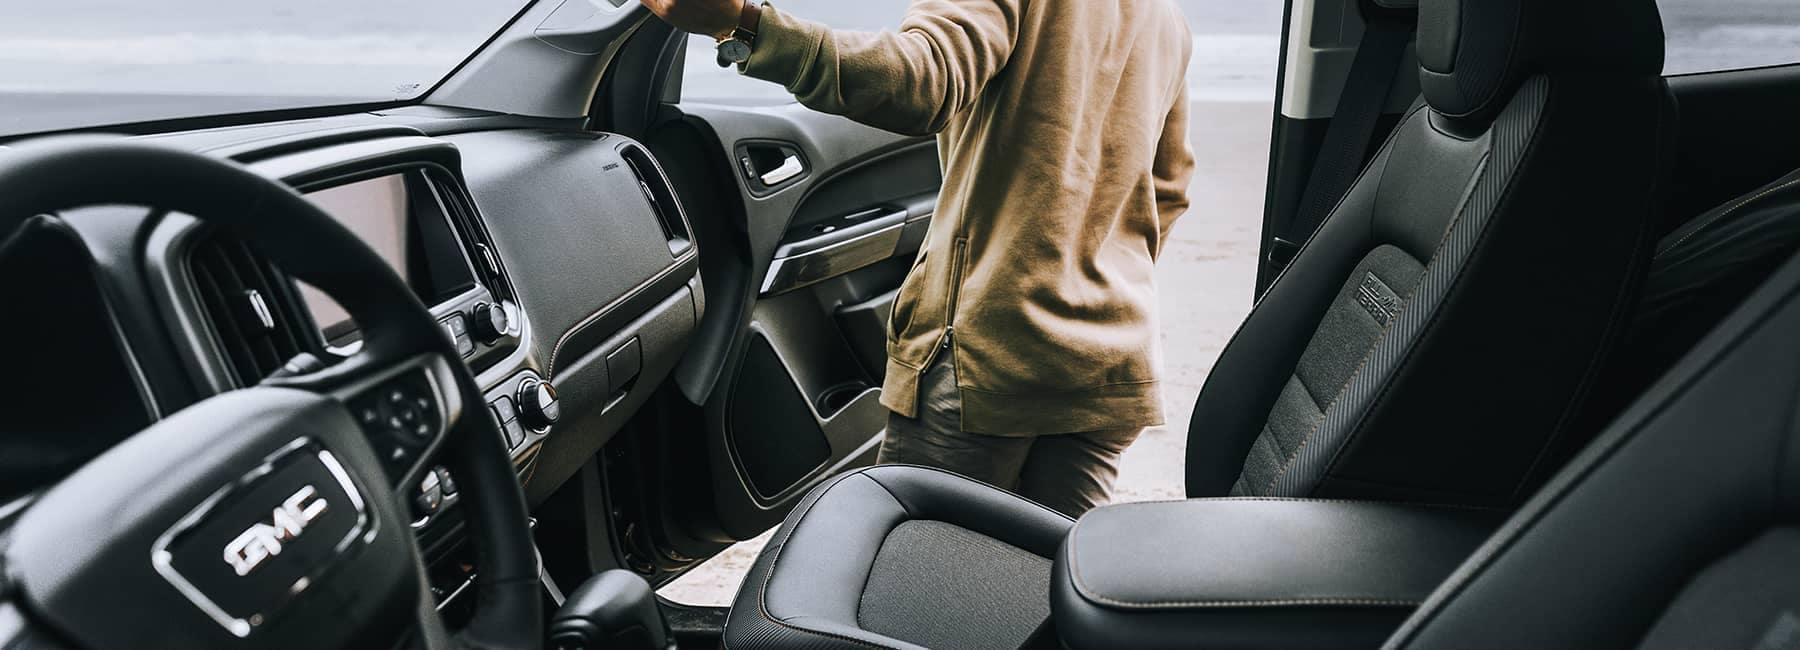 2020 GMC Canyon Interior Front Seat